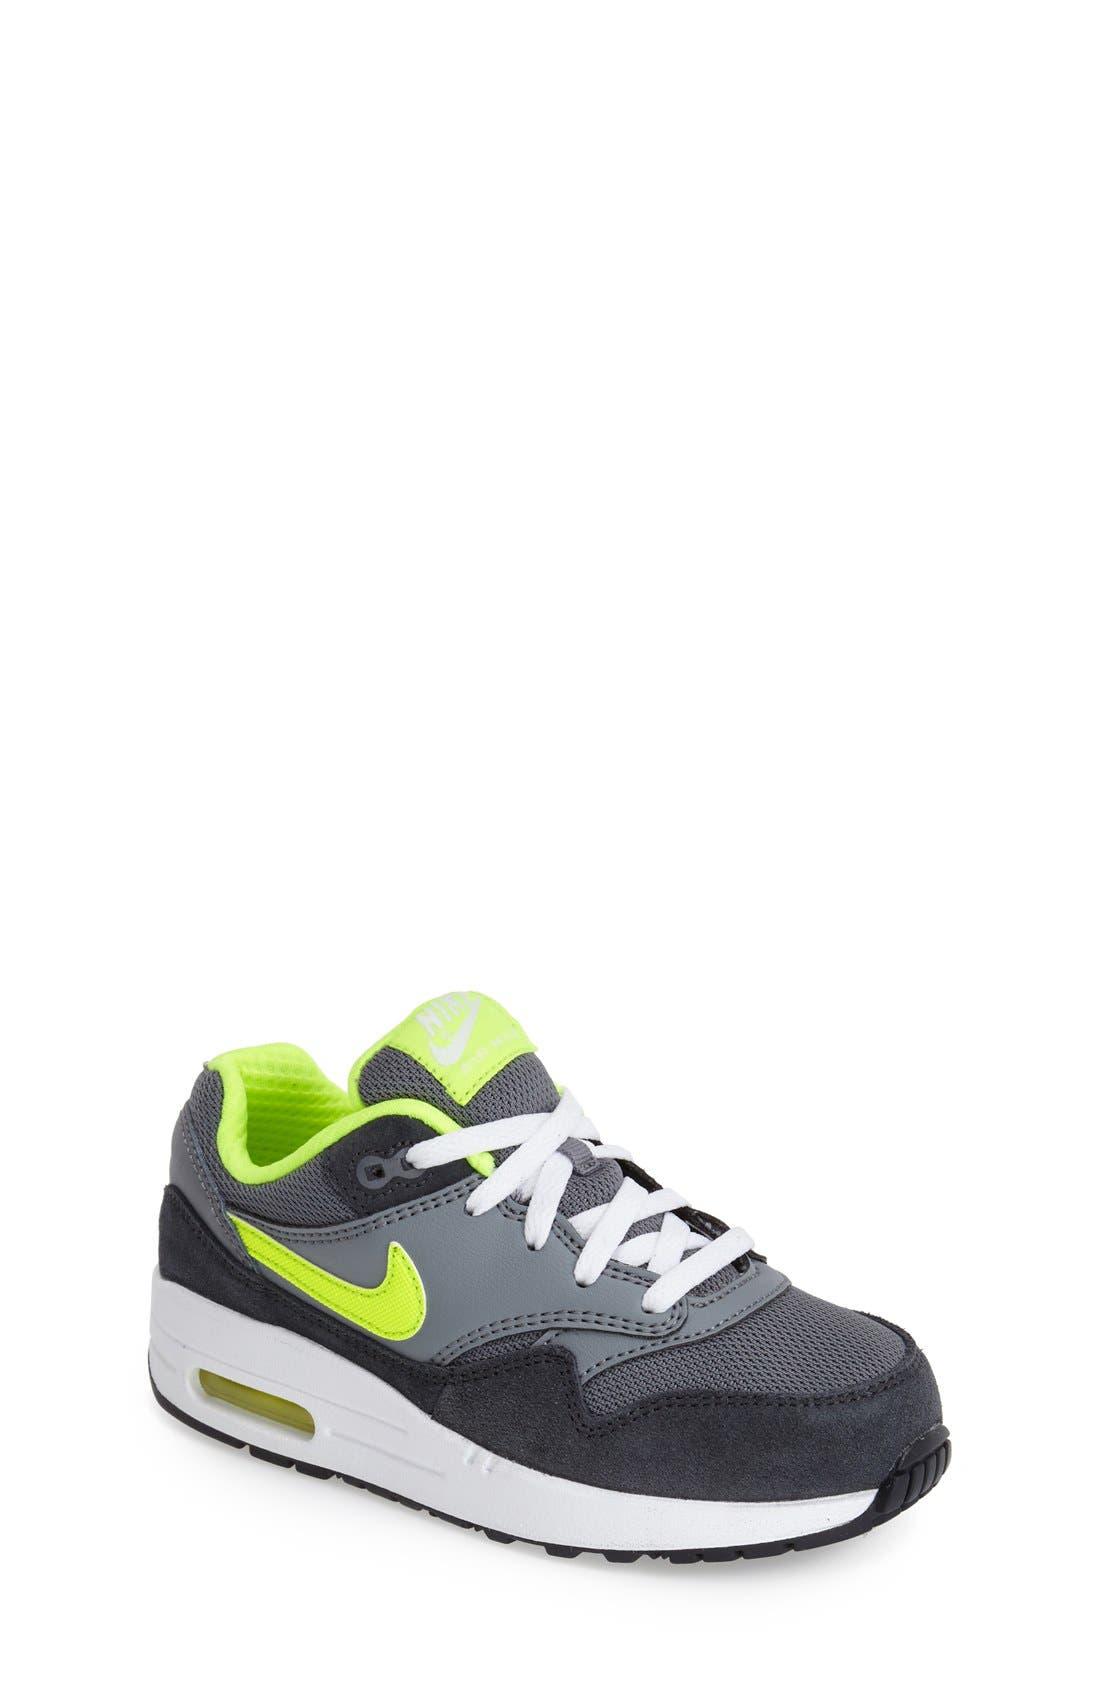 Main Image - Nike 'Air Max 1 PS' Sneaker (Toddler & Little Kid)